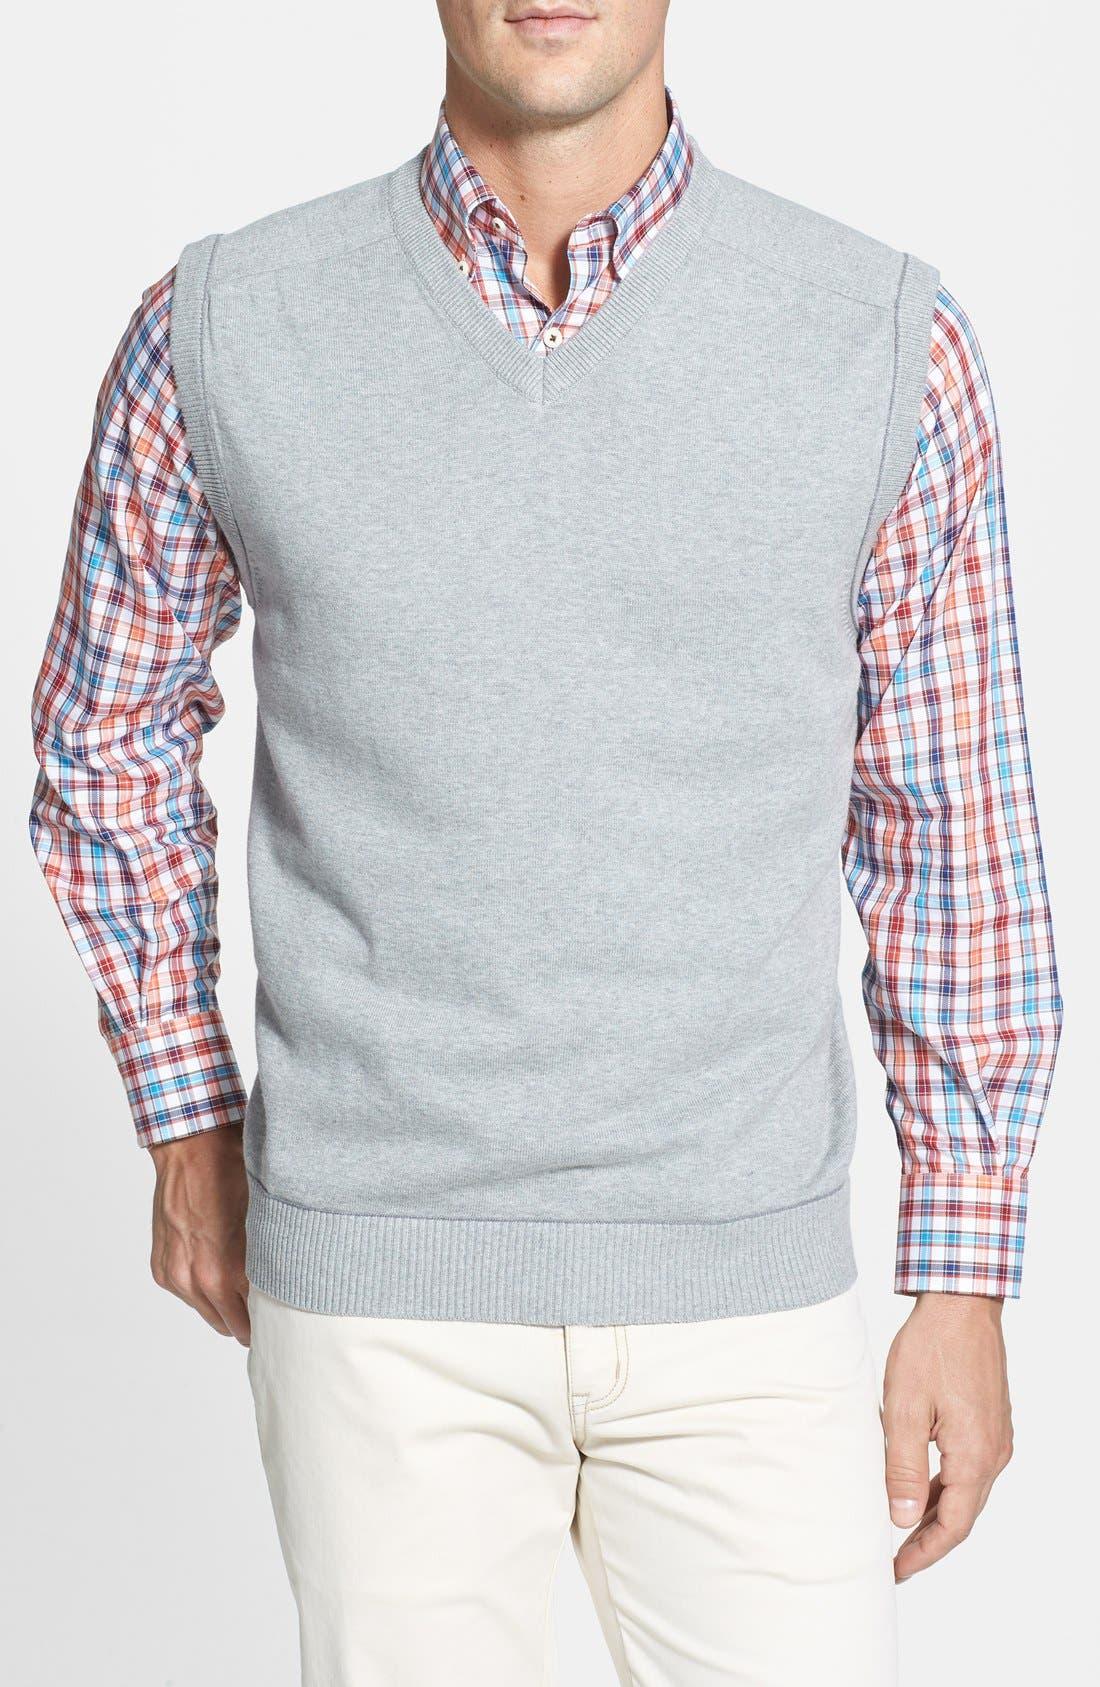 Alternate Image 1 Selected - Cutter & Buck Broadview V-Neck Sweater Vest